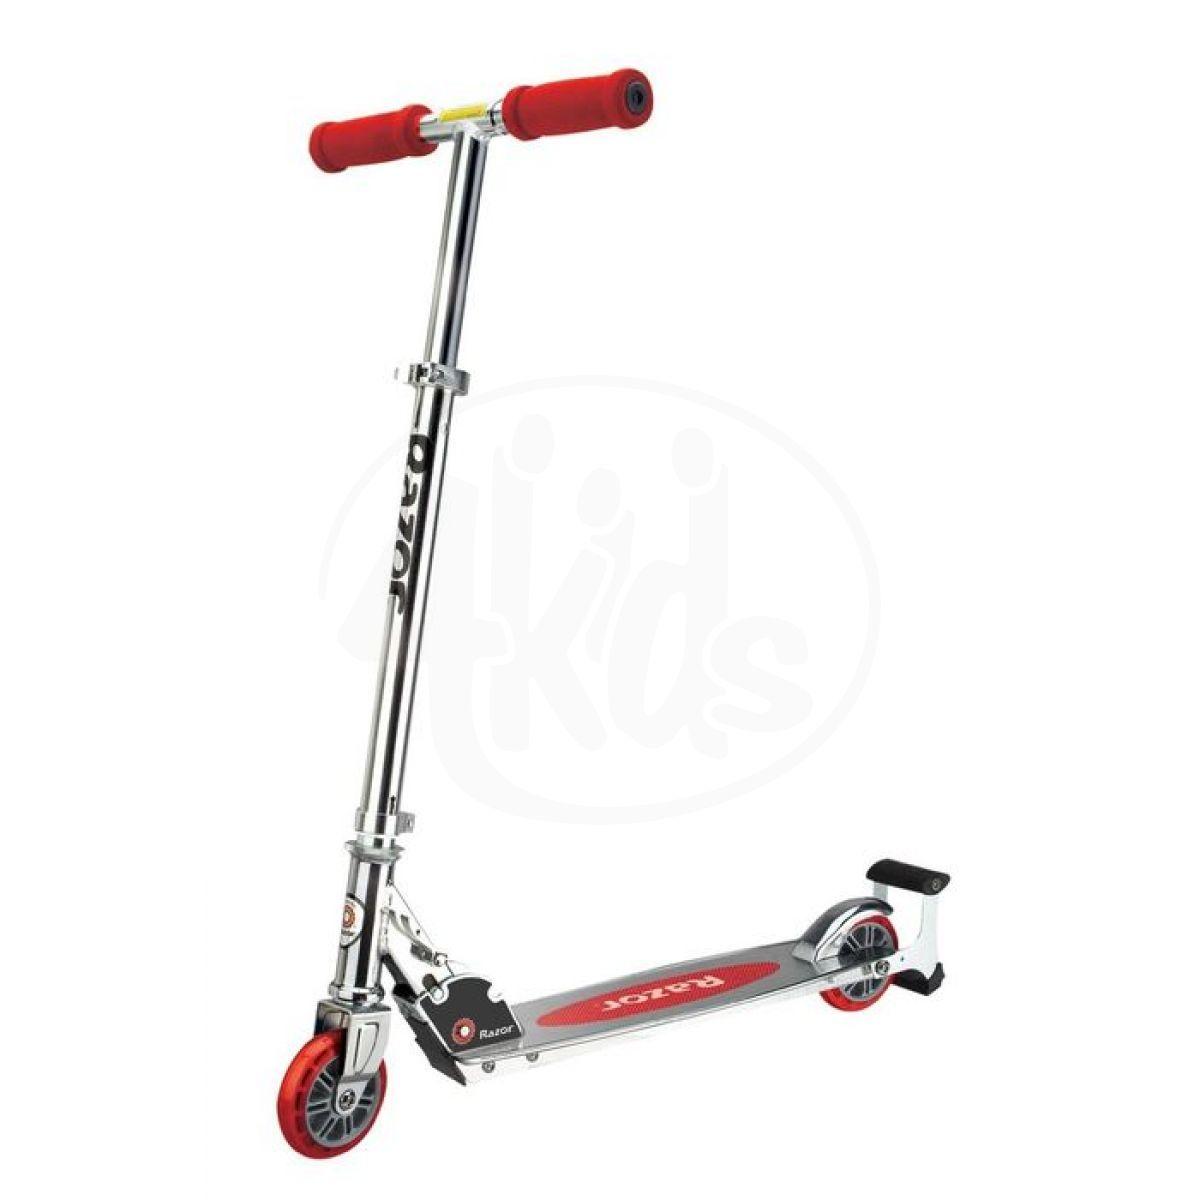 Razor Koloběžka Spark Scooter w125mm wheels Red EU